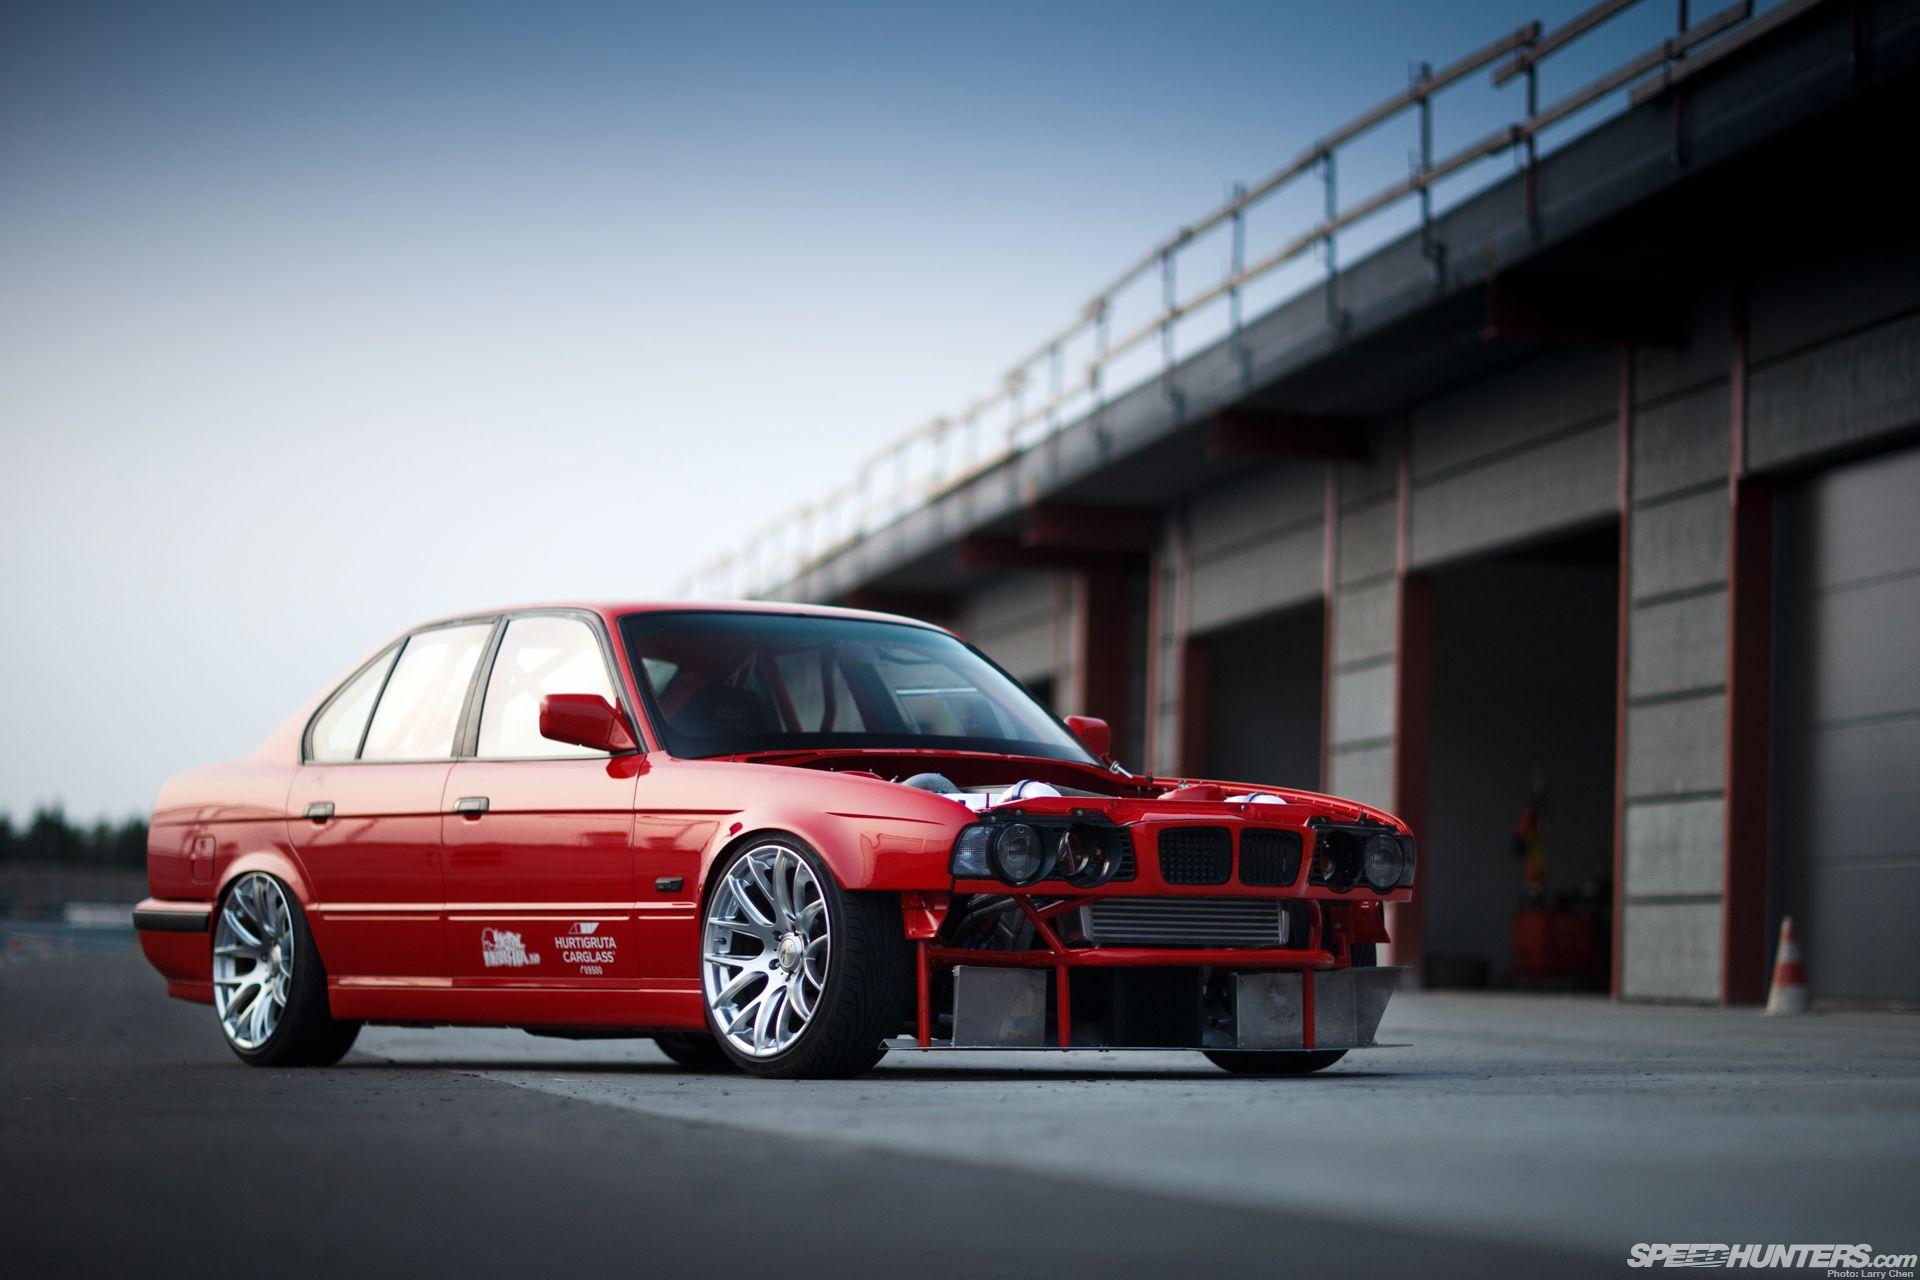 Bmw e34 wow so nice garage pinterest bmw cars for Garage bmw nice